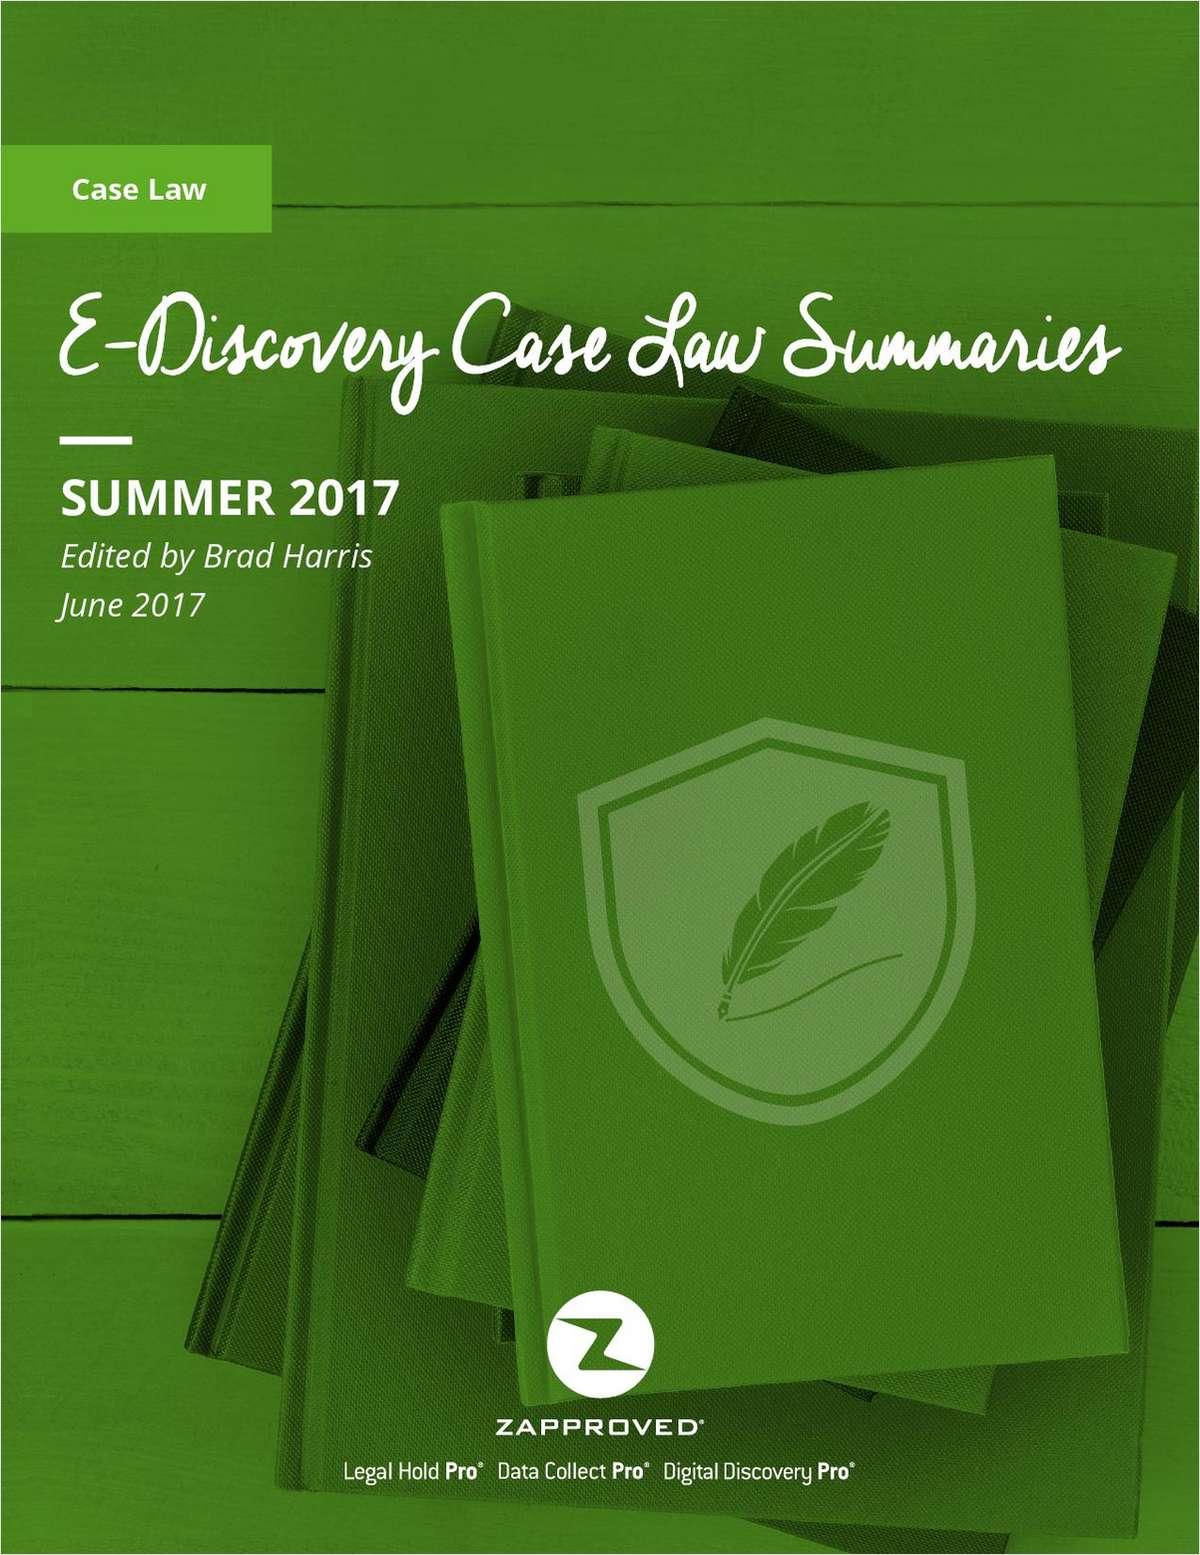 Case Law Summaries: Summer 2017 Edition